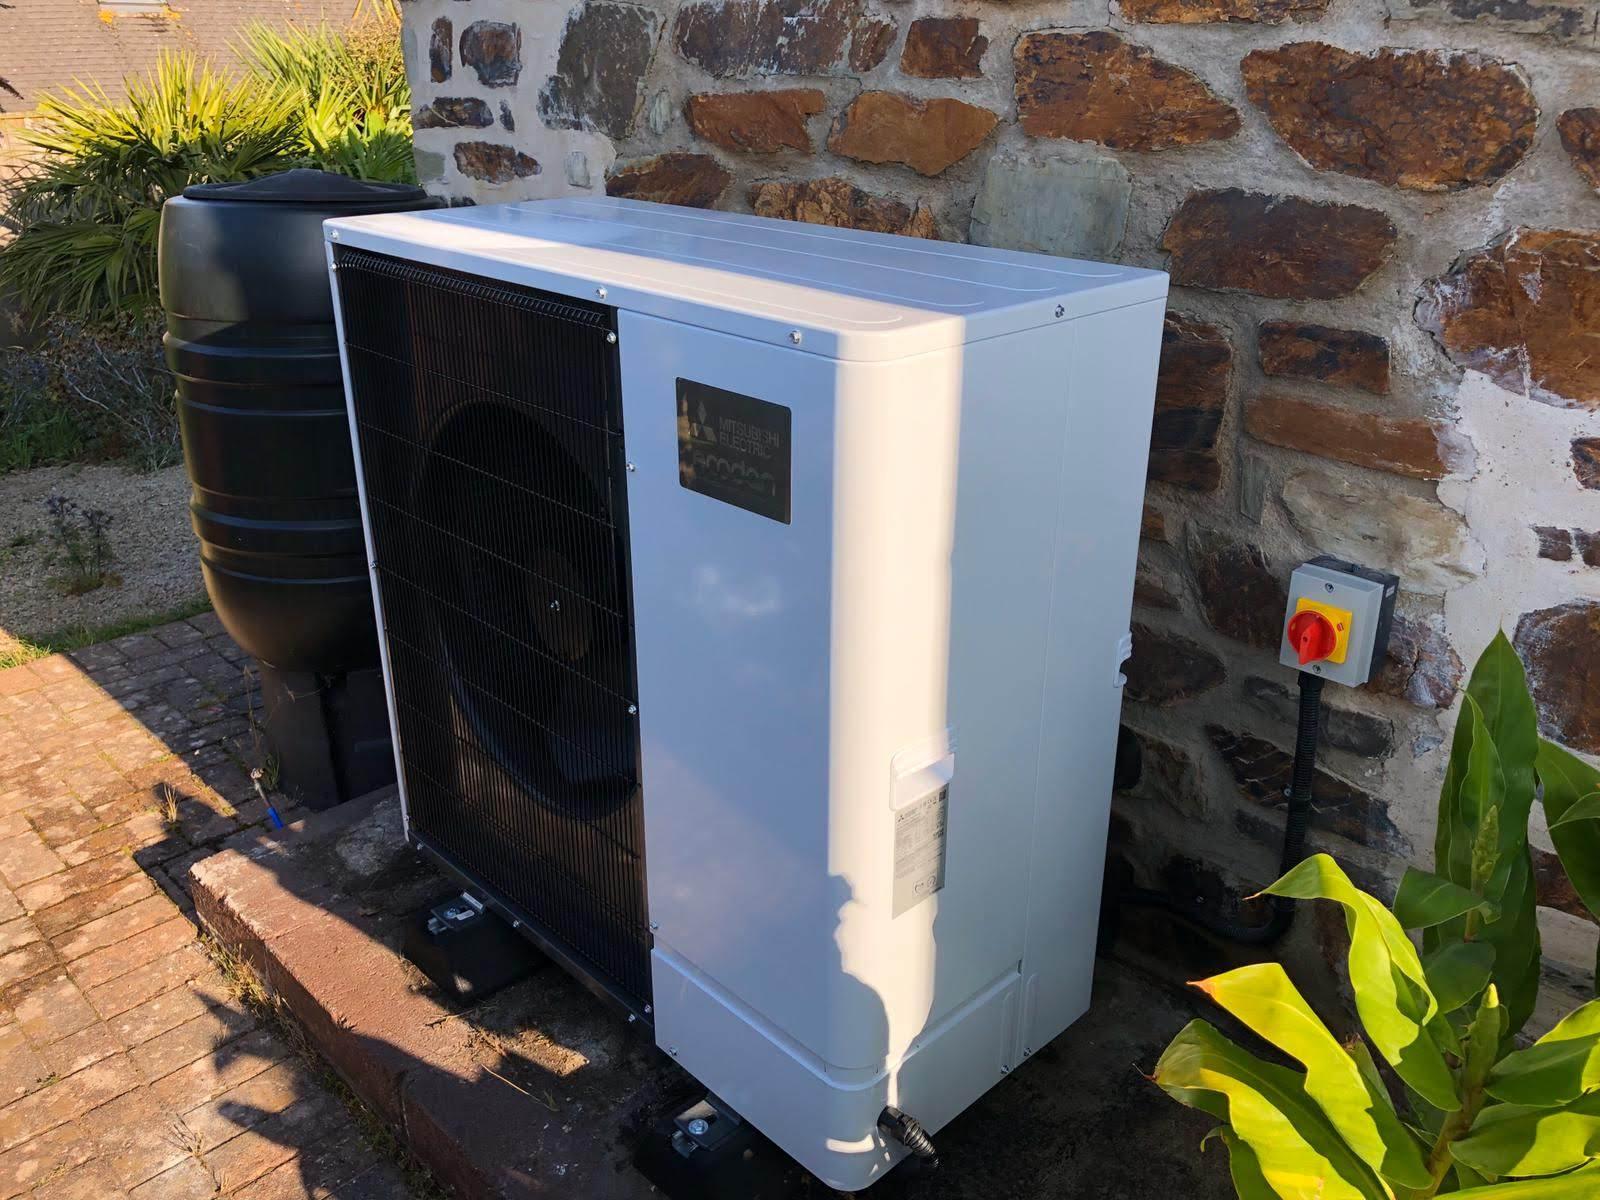 An 8.5kW Ultra Quiet Ecodan air source installation in Praa Sands.